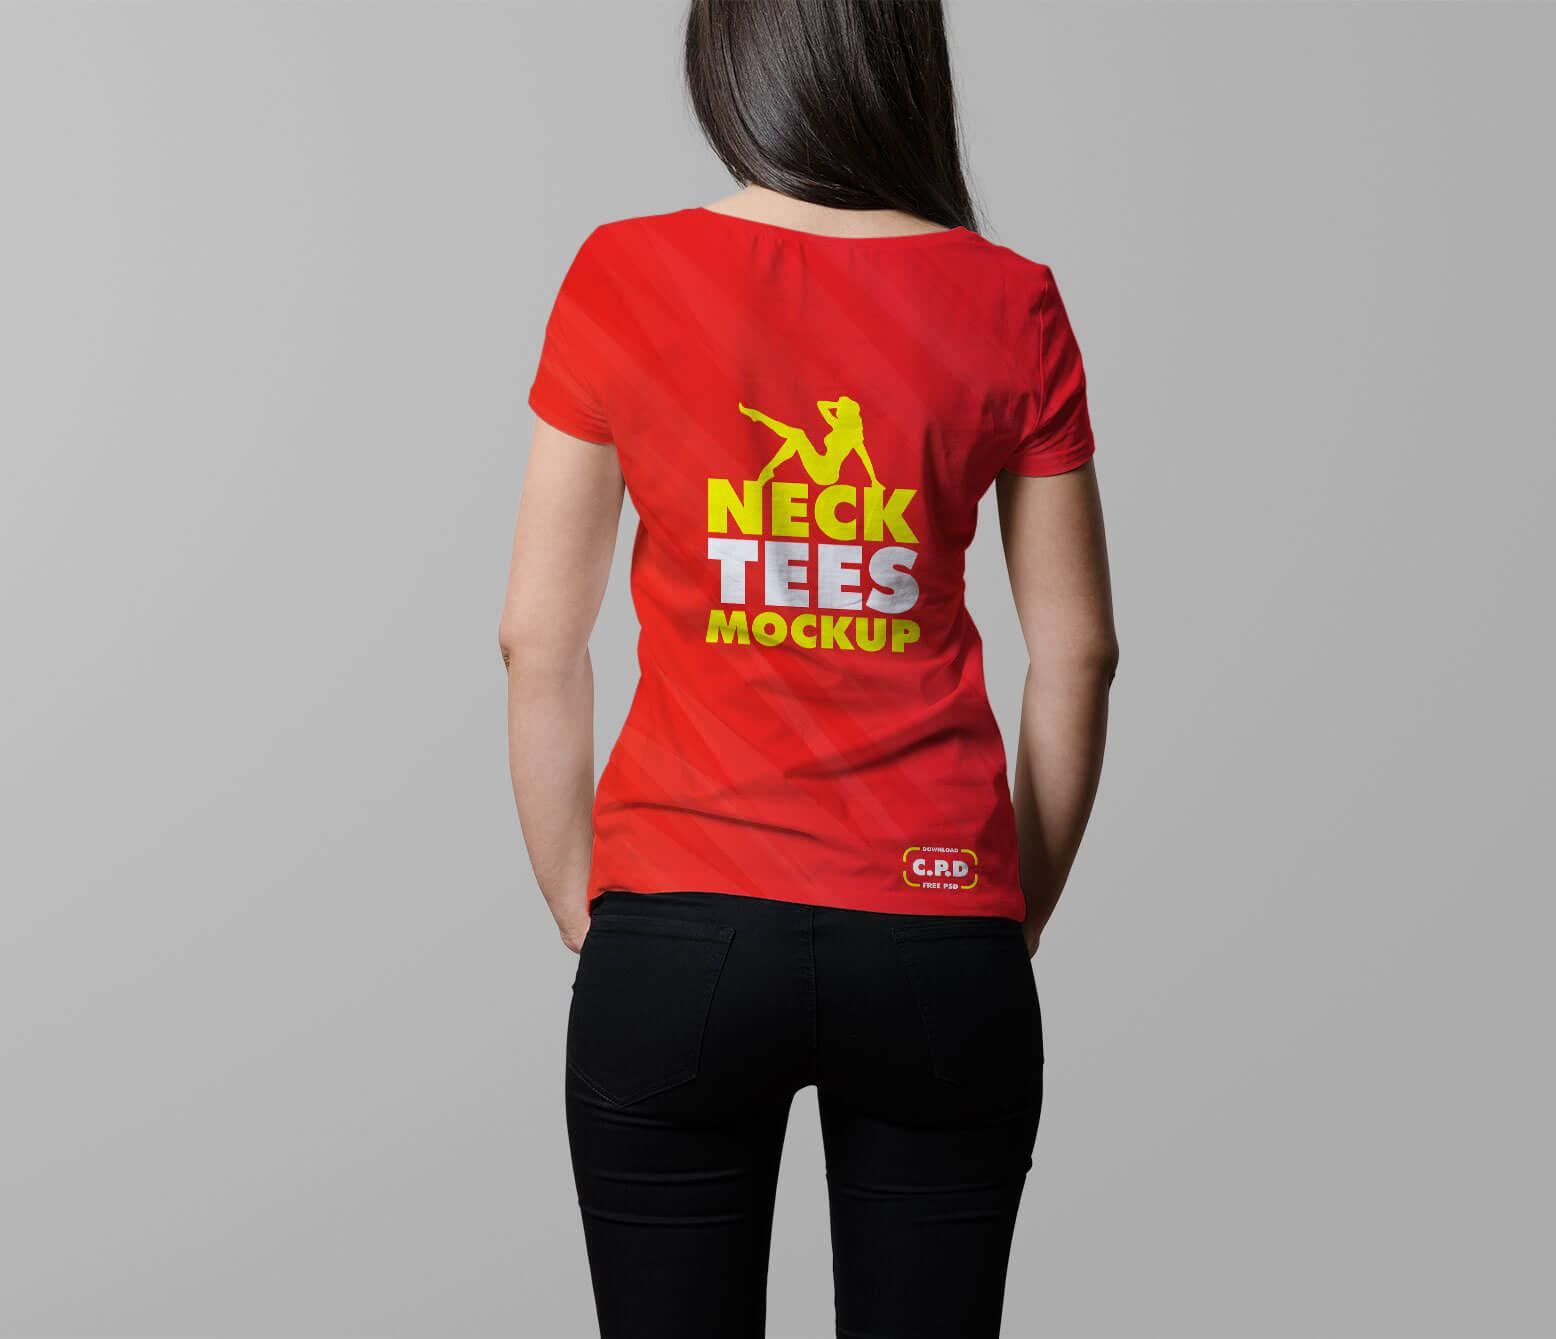 V-Neck Female T-Shirt Mockup Free Psd, t shirt back side mockup, back side t shirt mockup,